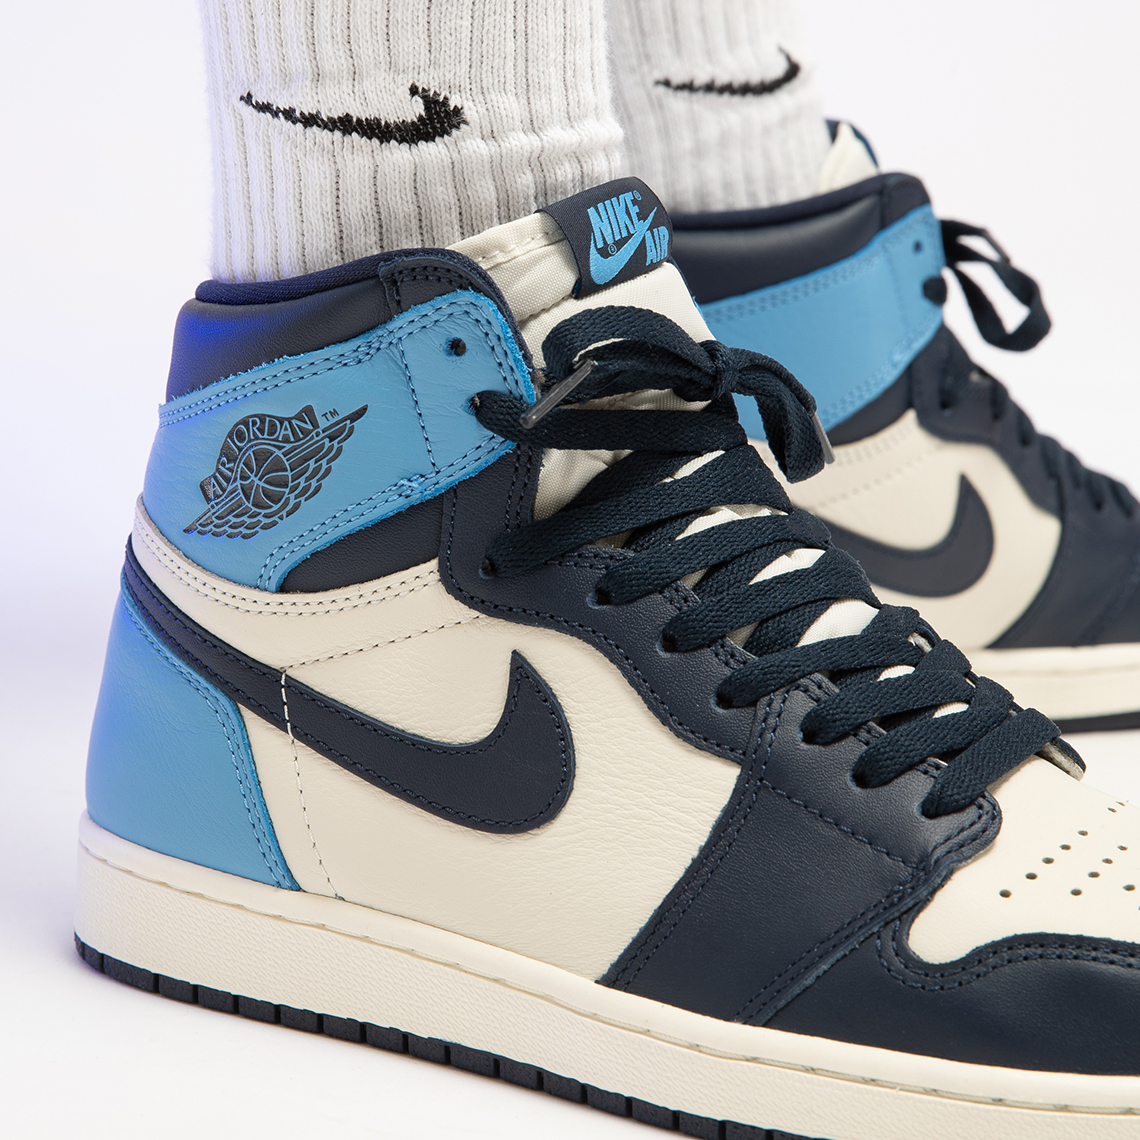 Jordan 1 Unc Obsidian 555088 140 Store List Sneakernews Com